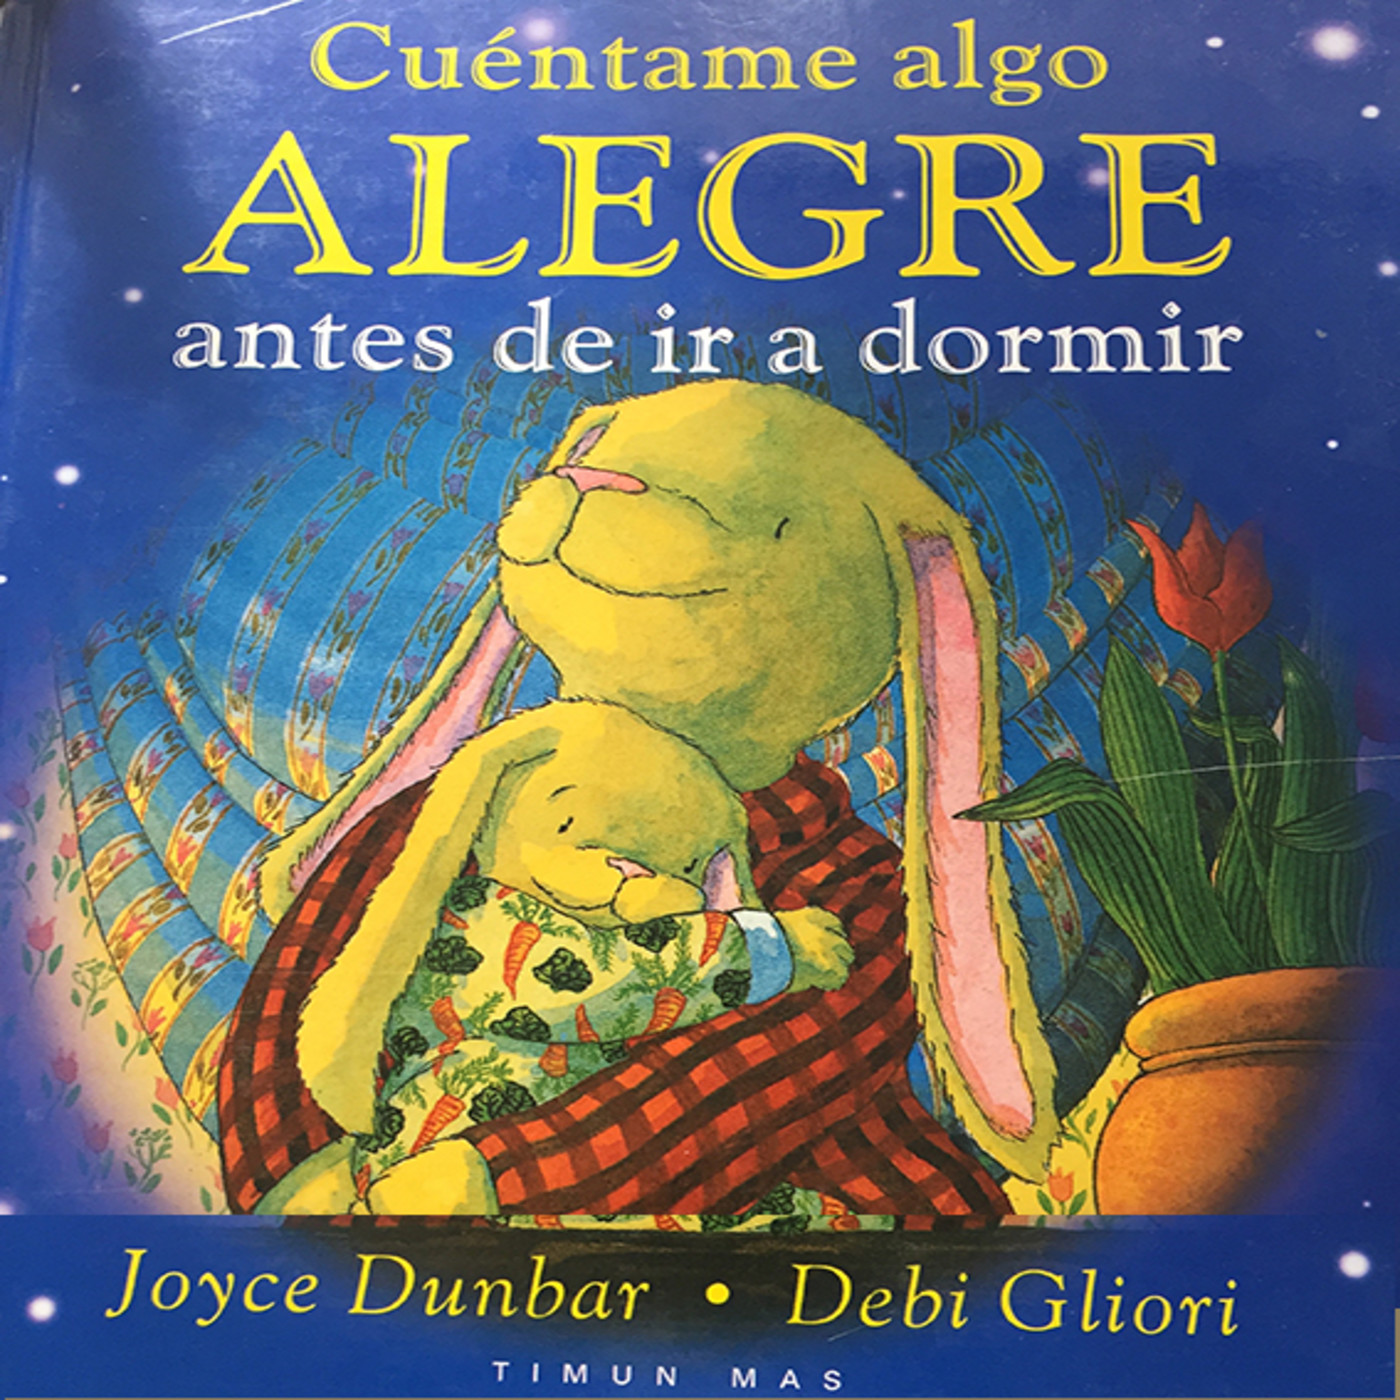 Cuéntame algo alegre antes de dormir. Joyce Dumbar